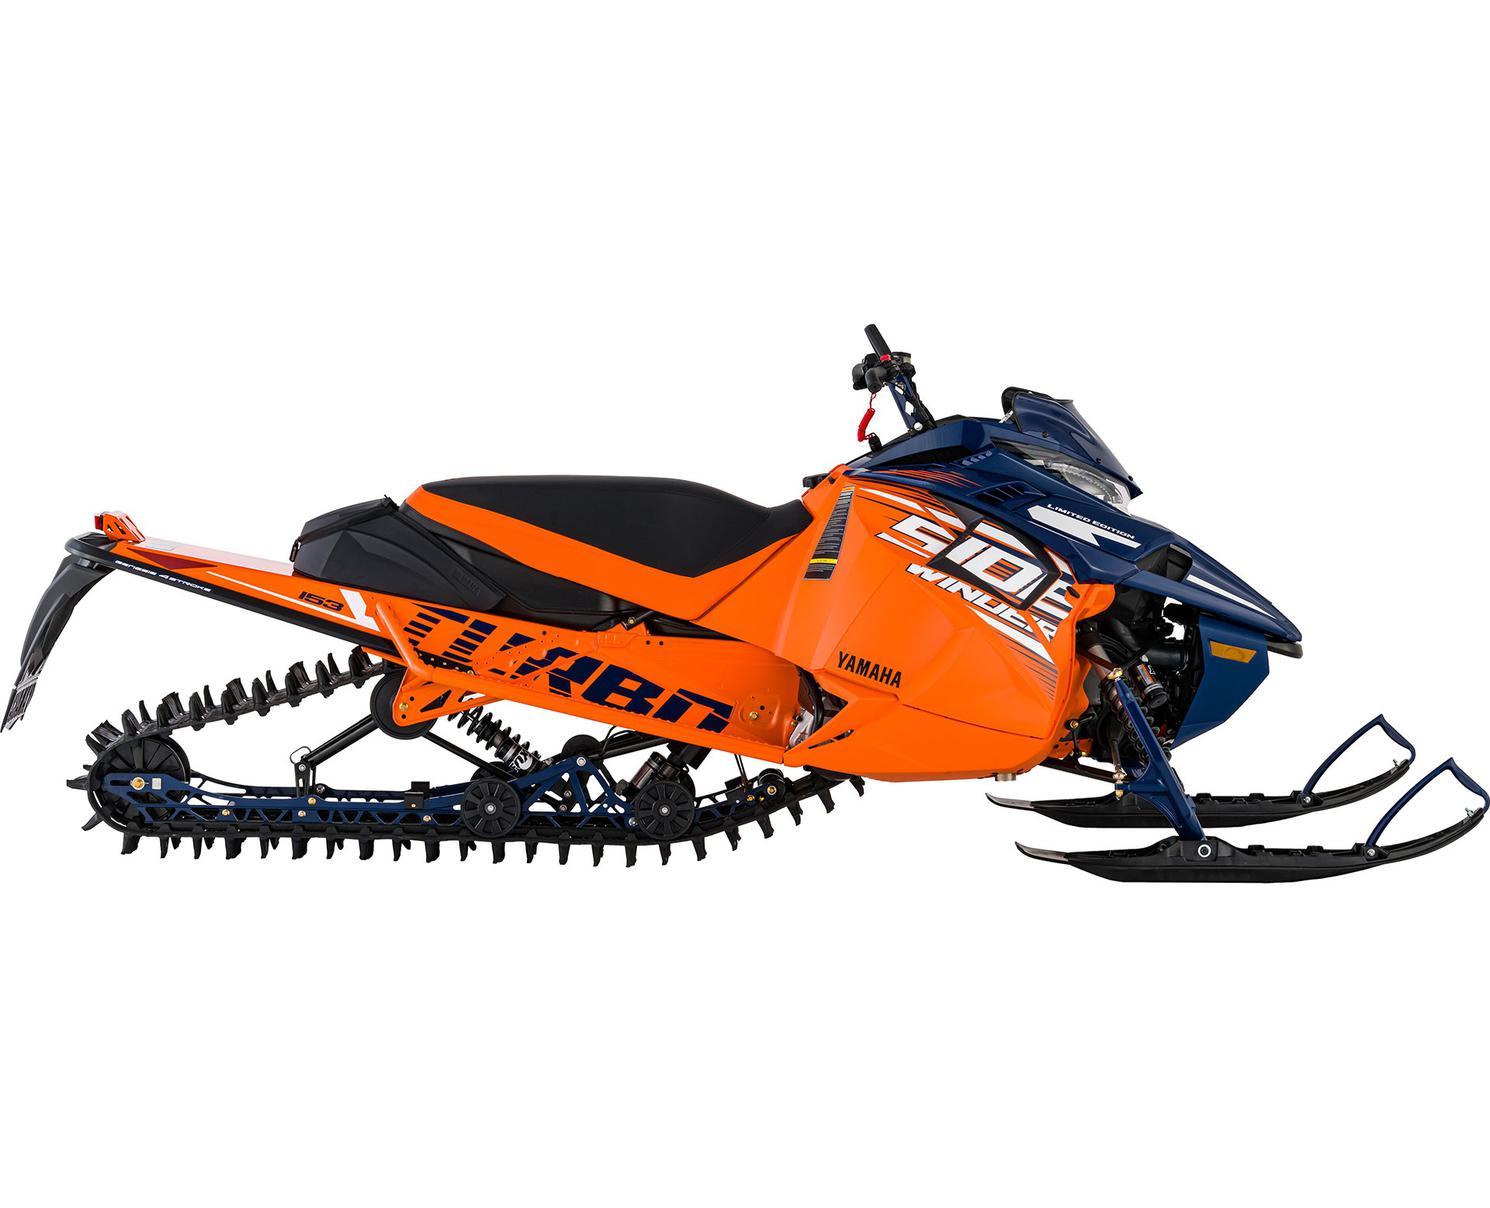 Yamaha Sidewinder B-TX LE Bleu/Orange 2021